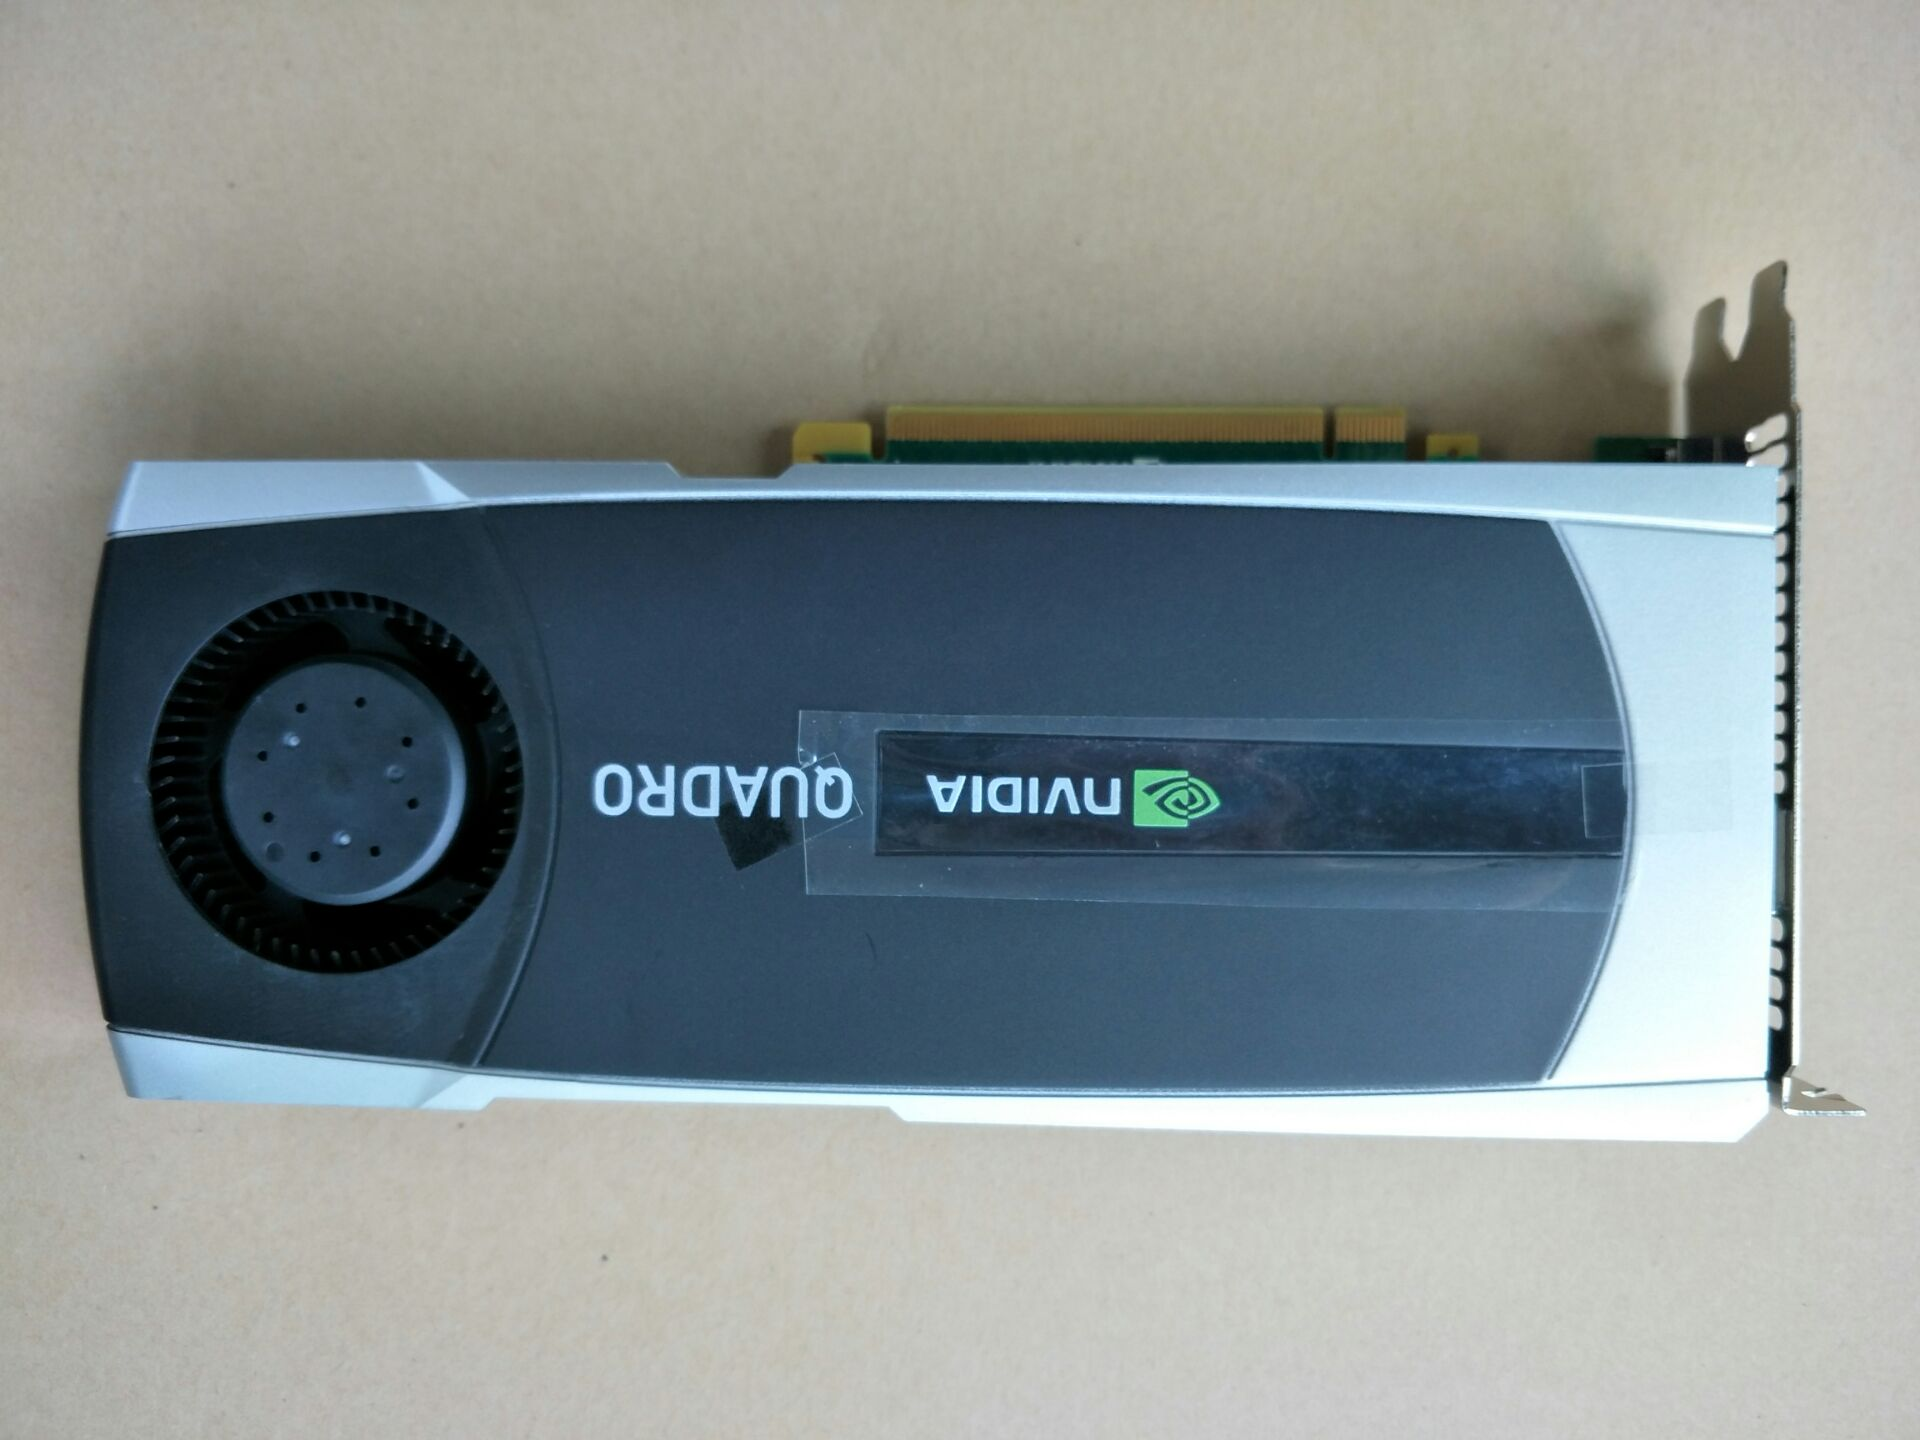 Quadro 6000 Q6000 6GB DDR5 Professional  Graphics Card 3D Rendering / Scene Modeling